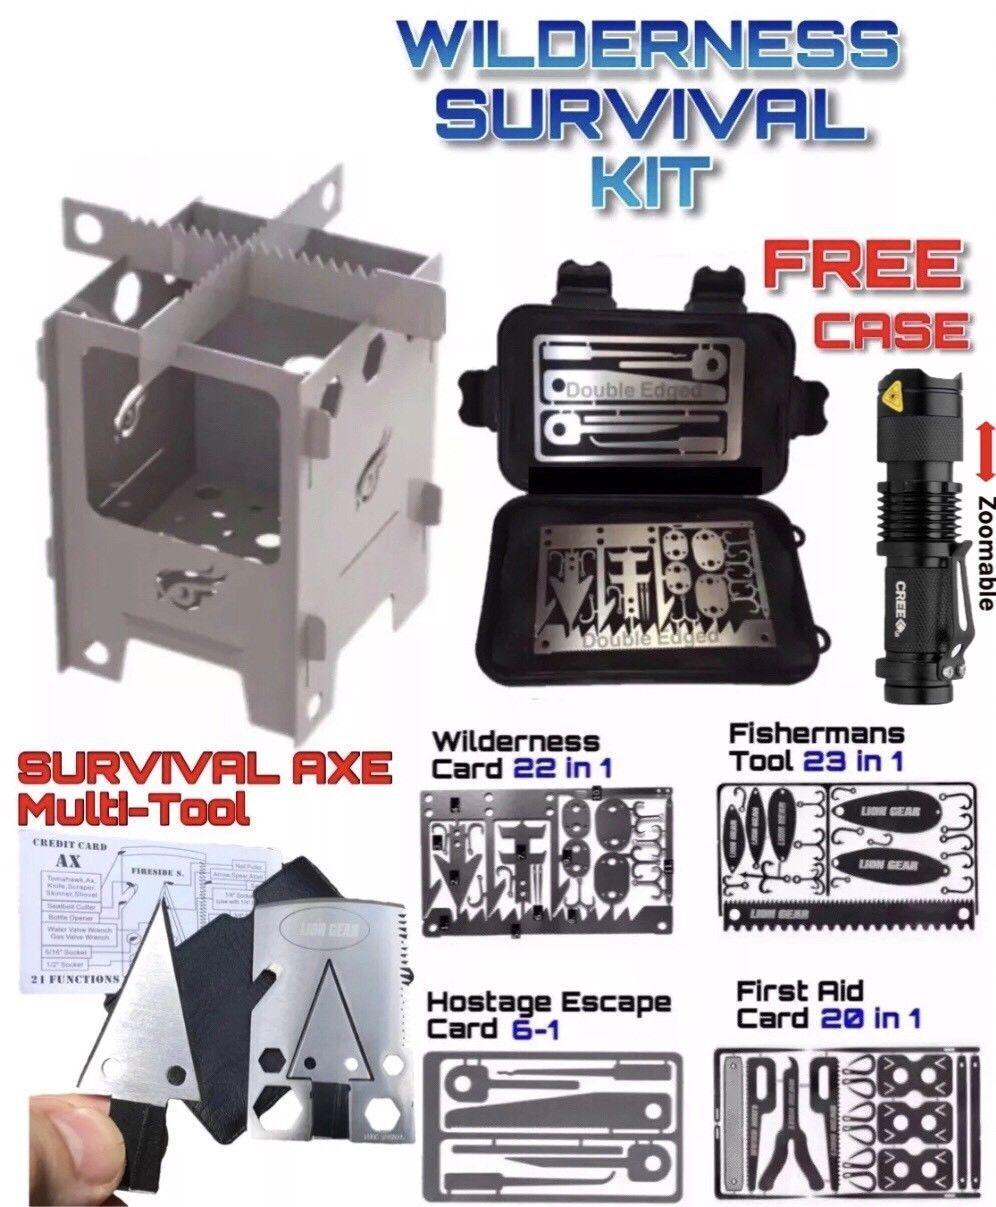 Conjunto de tarjeta de súpervivencia Hacha Caza Pesca de primeros auxilios Escape Mini Estufa Q5 Linterna